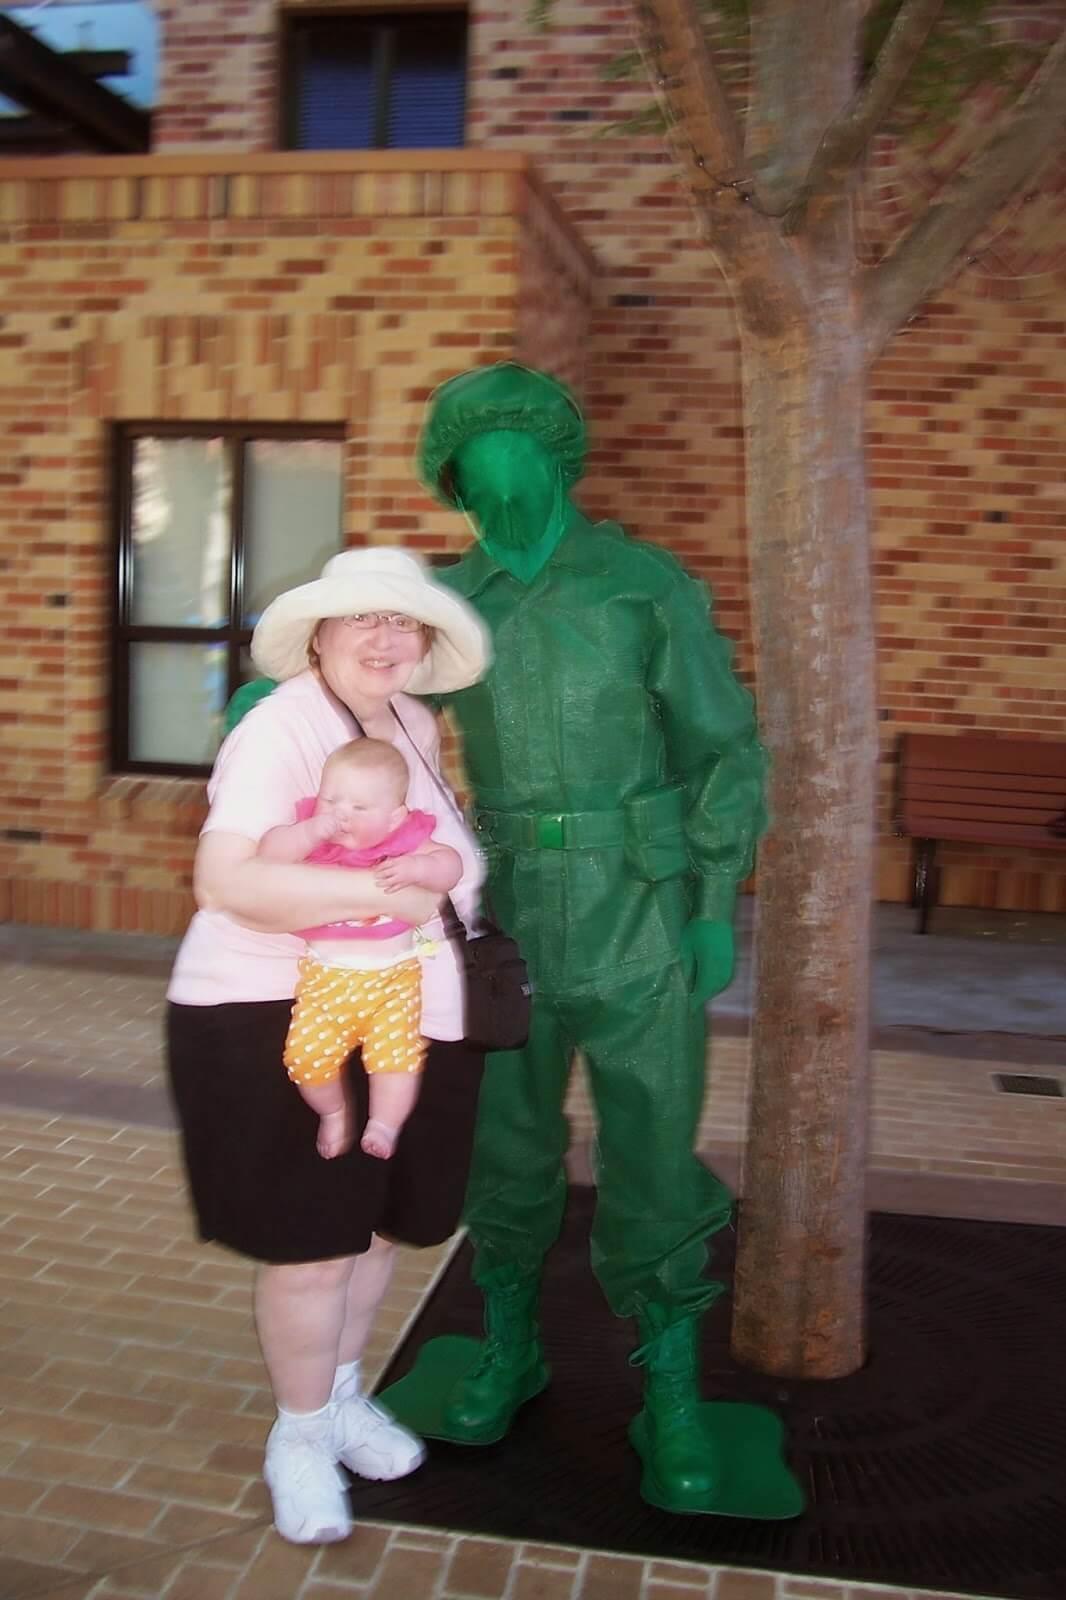 meet Toy Story Green Army Men at Hollywood Studios